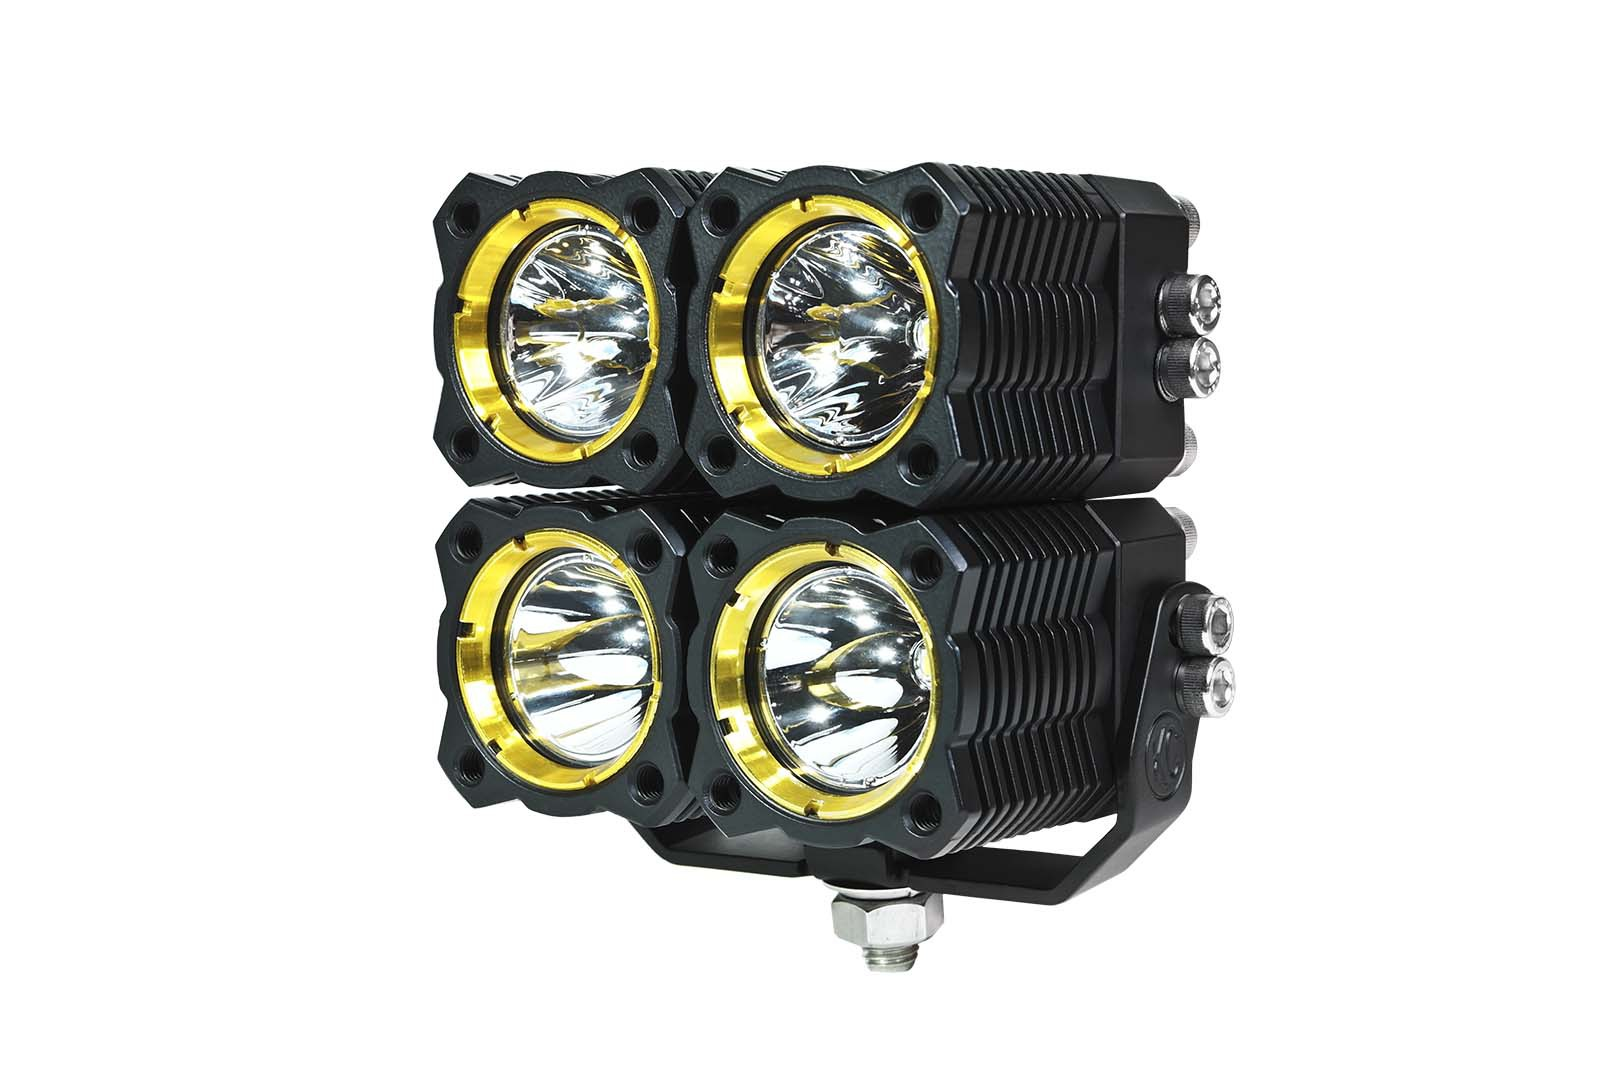 Wiring Harness Atv 2 Lights Kc Hilites Socal Supertrucks